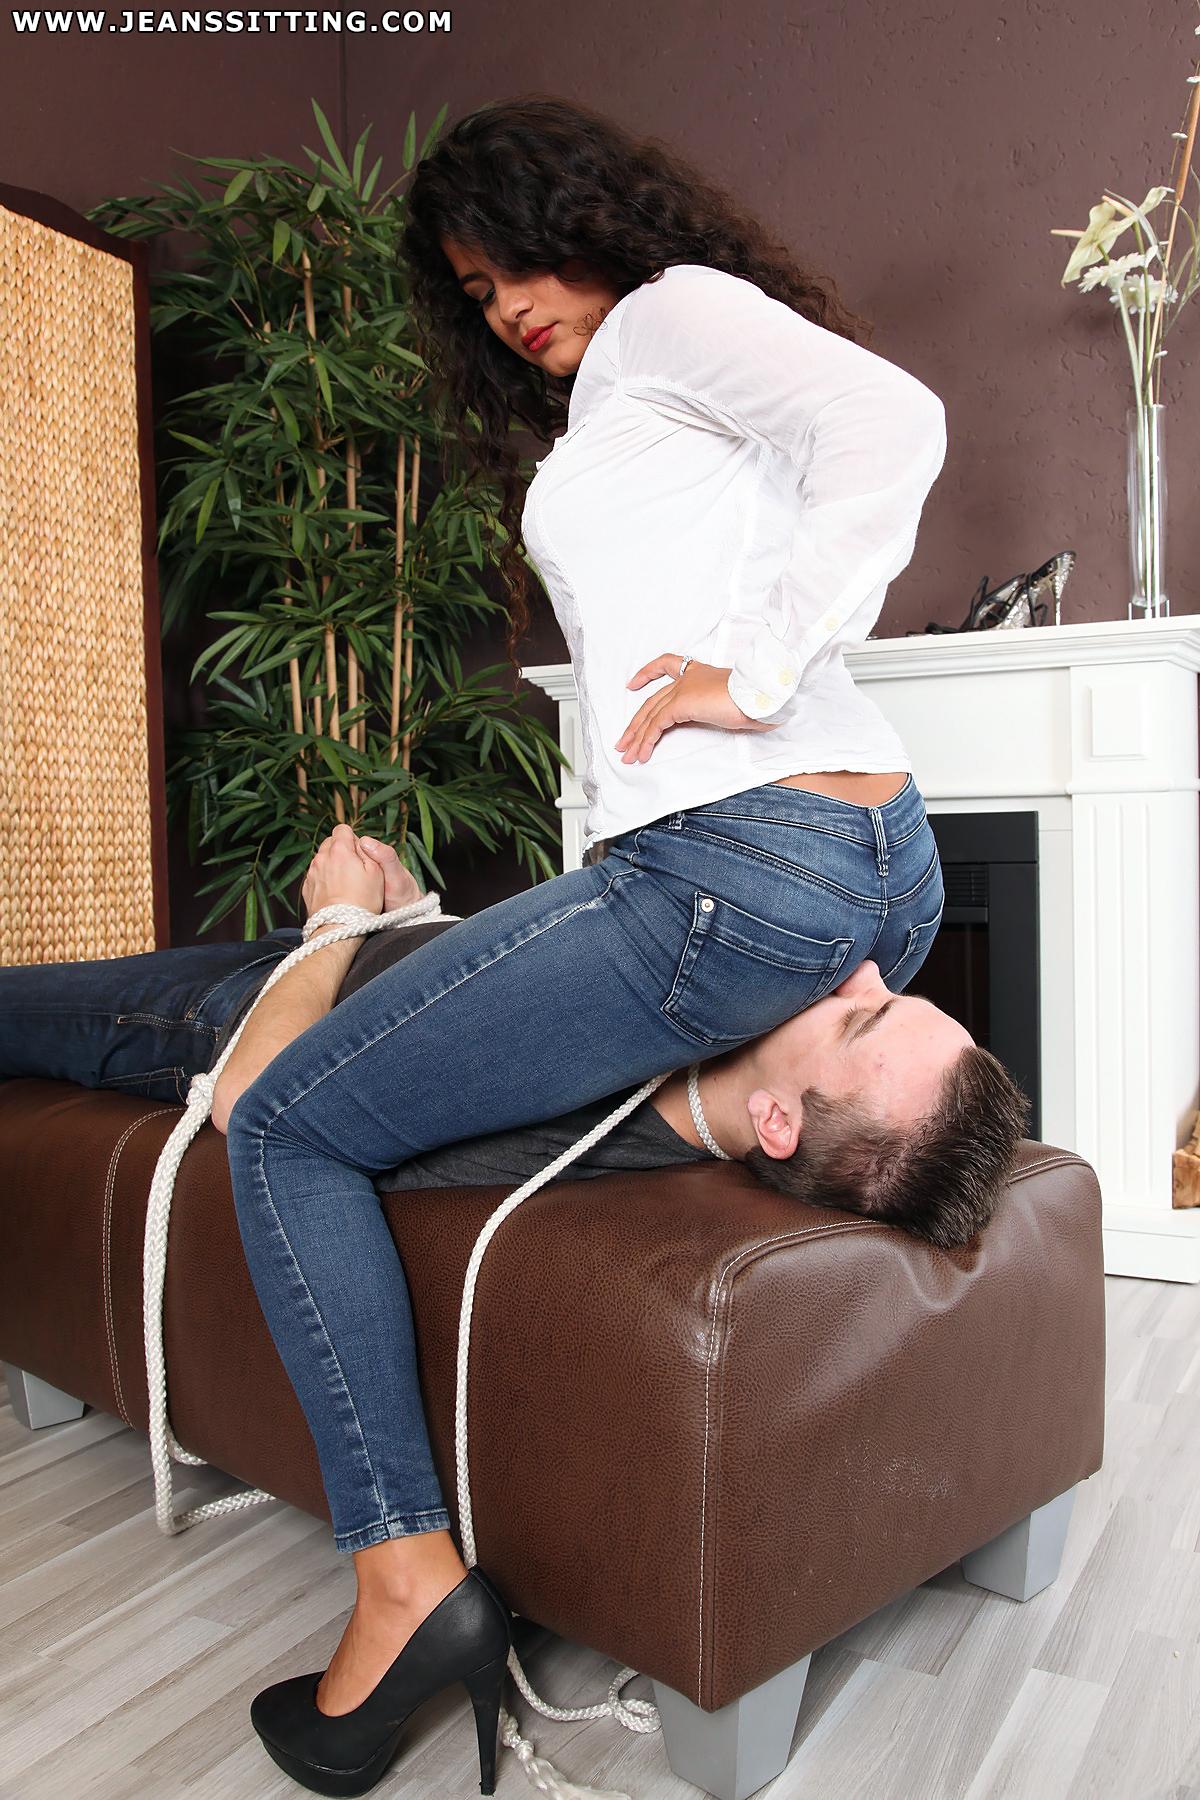 Facesitting Jeans